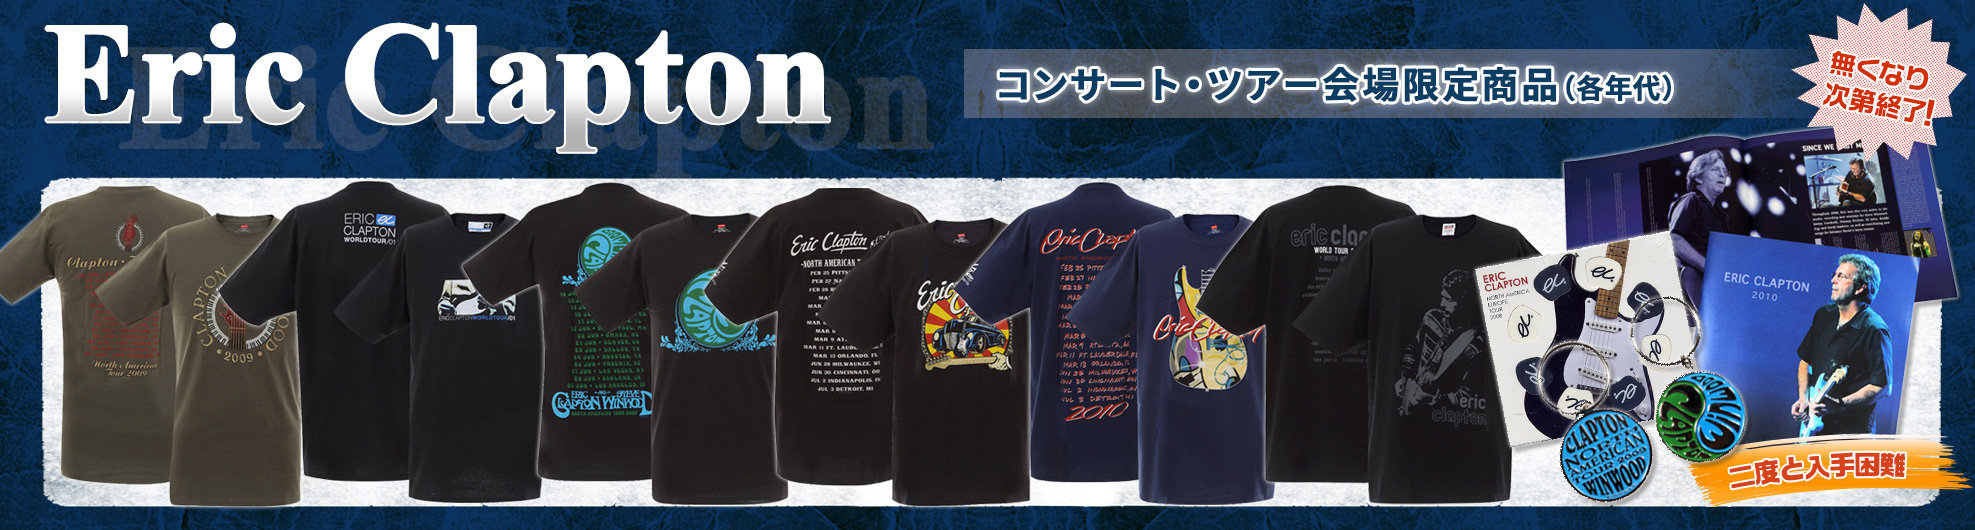 GUNS N ROSES来日ありがとうキャンペーン!Sonic Youth